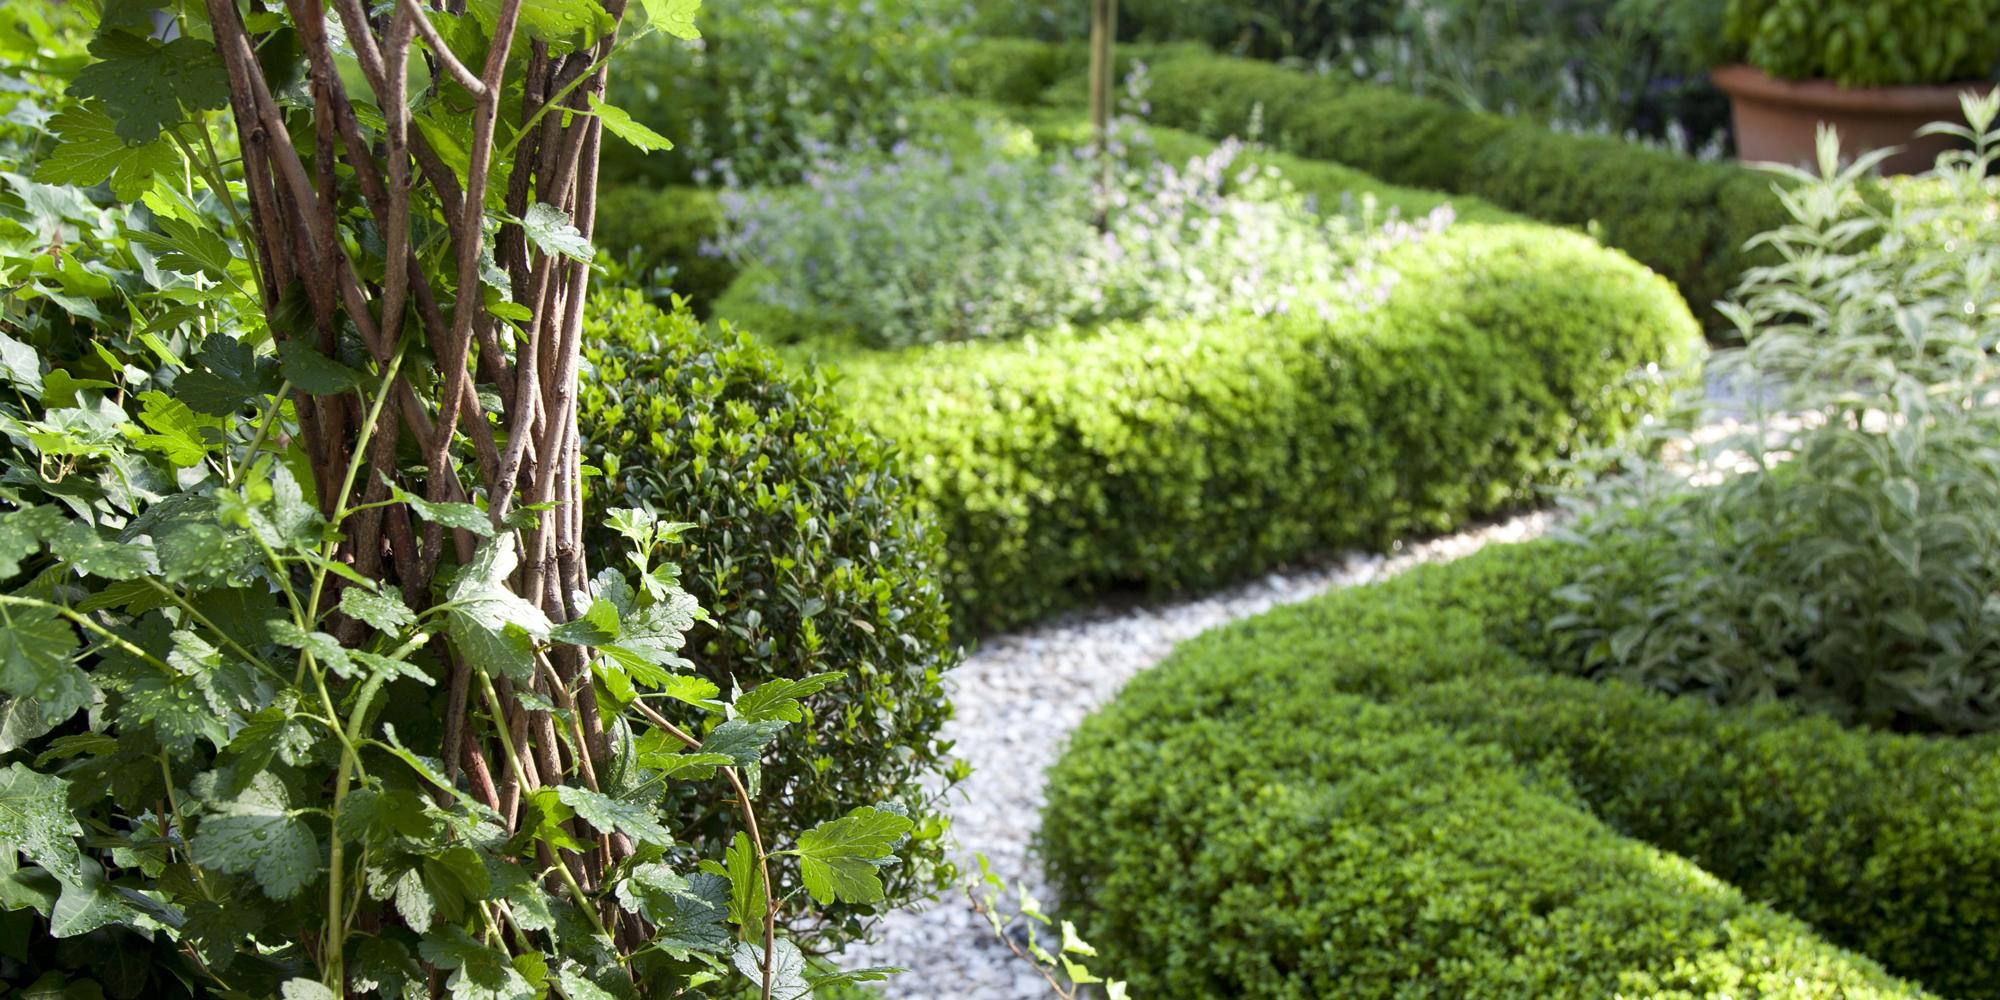 country-garden-path-index-image.jpg